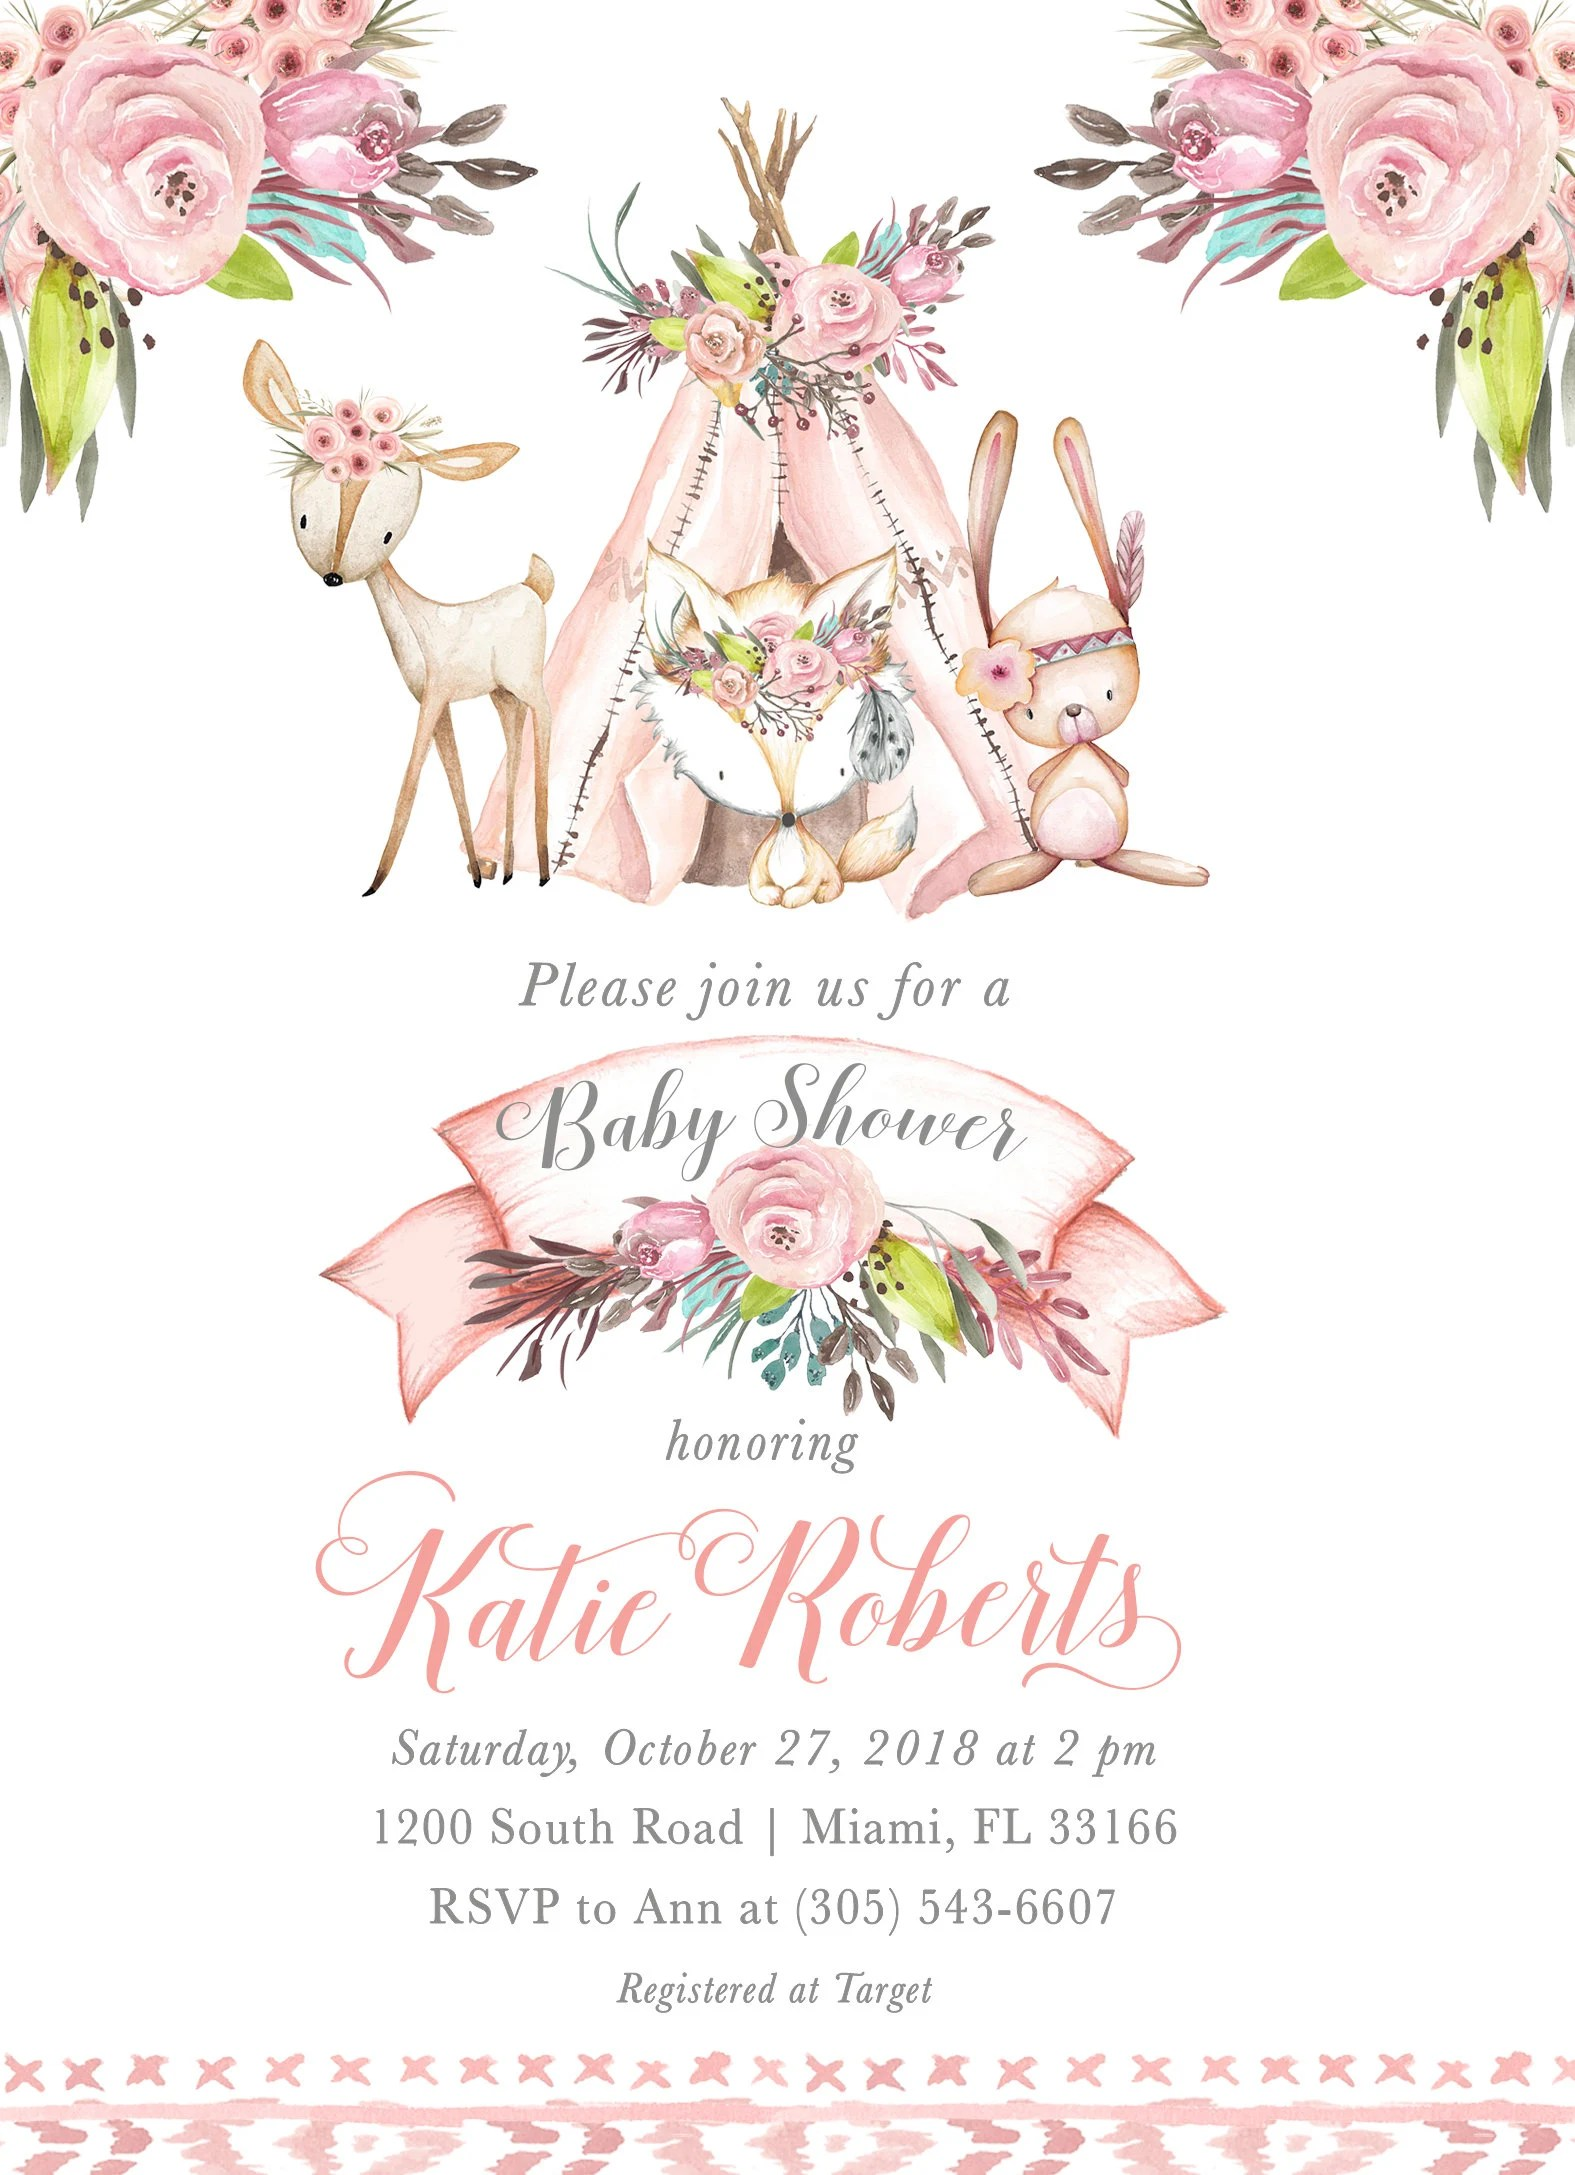 Baby Shower Invitations Boho